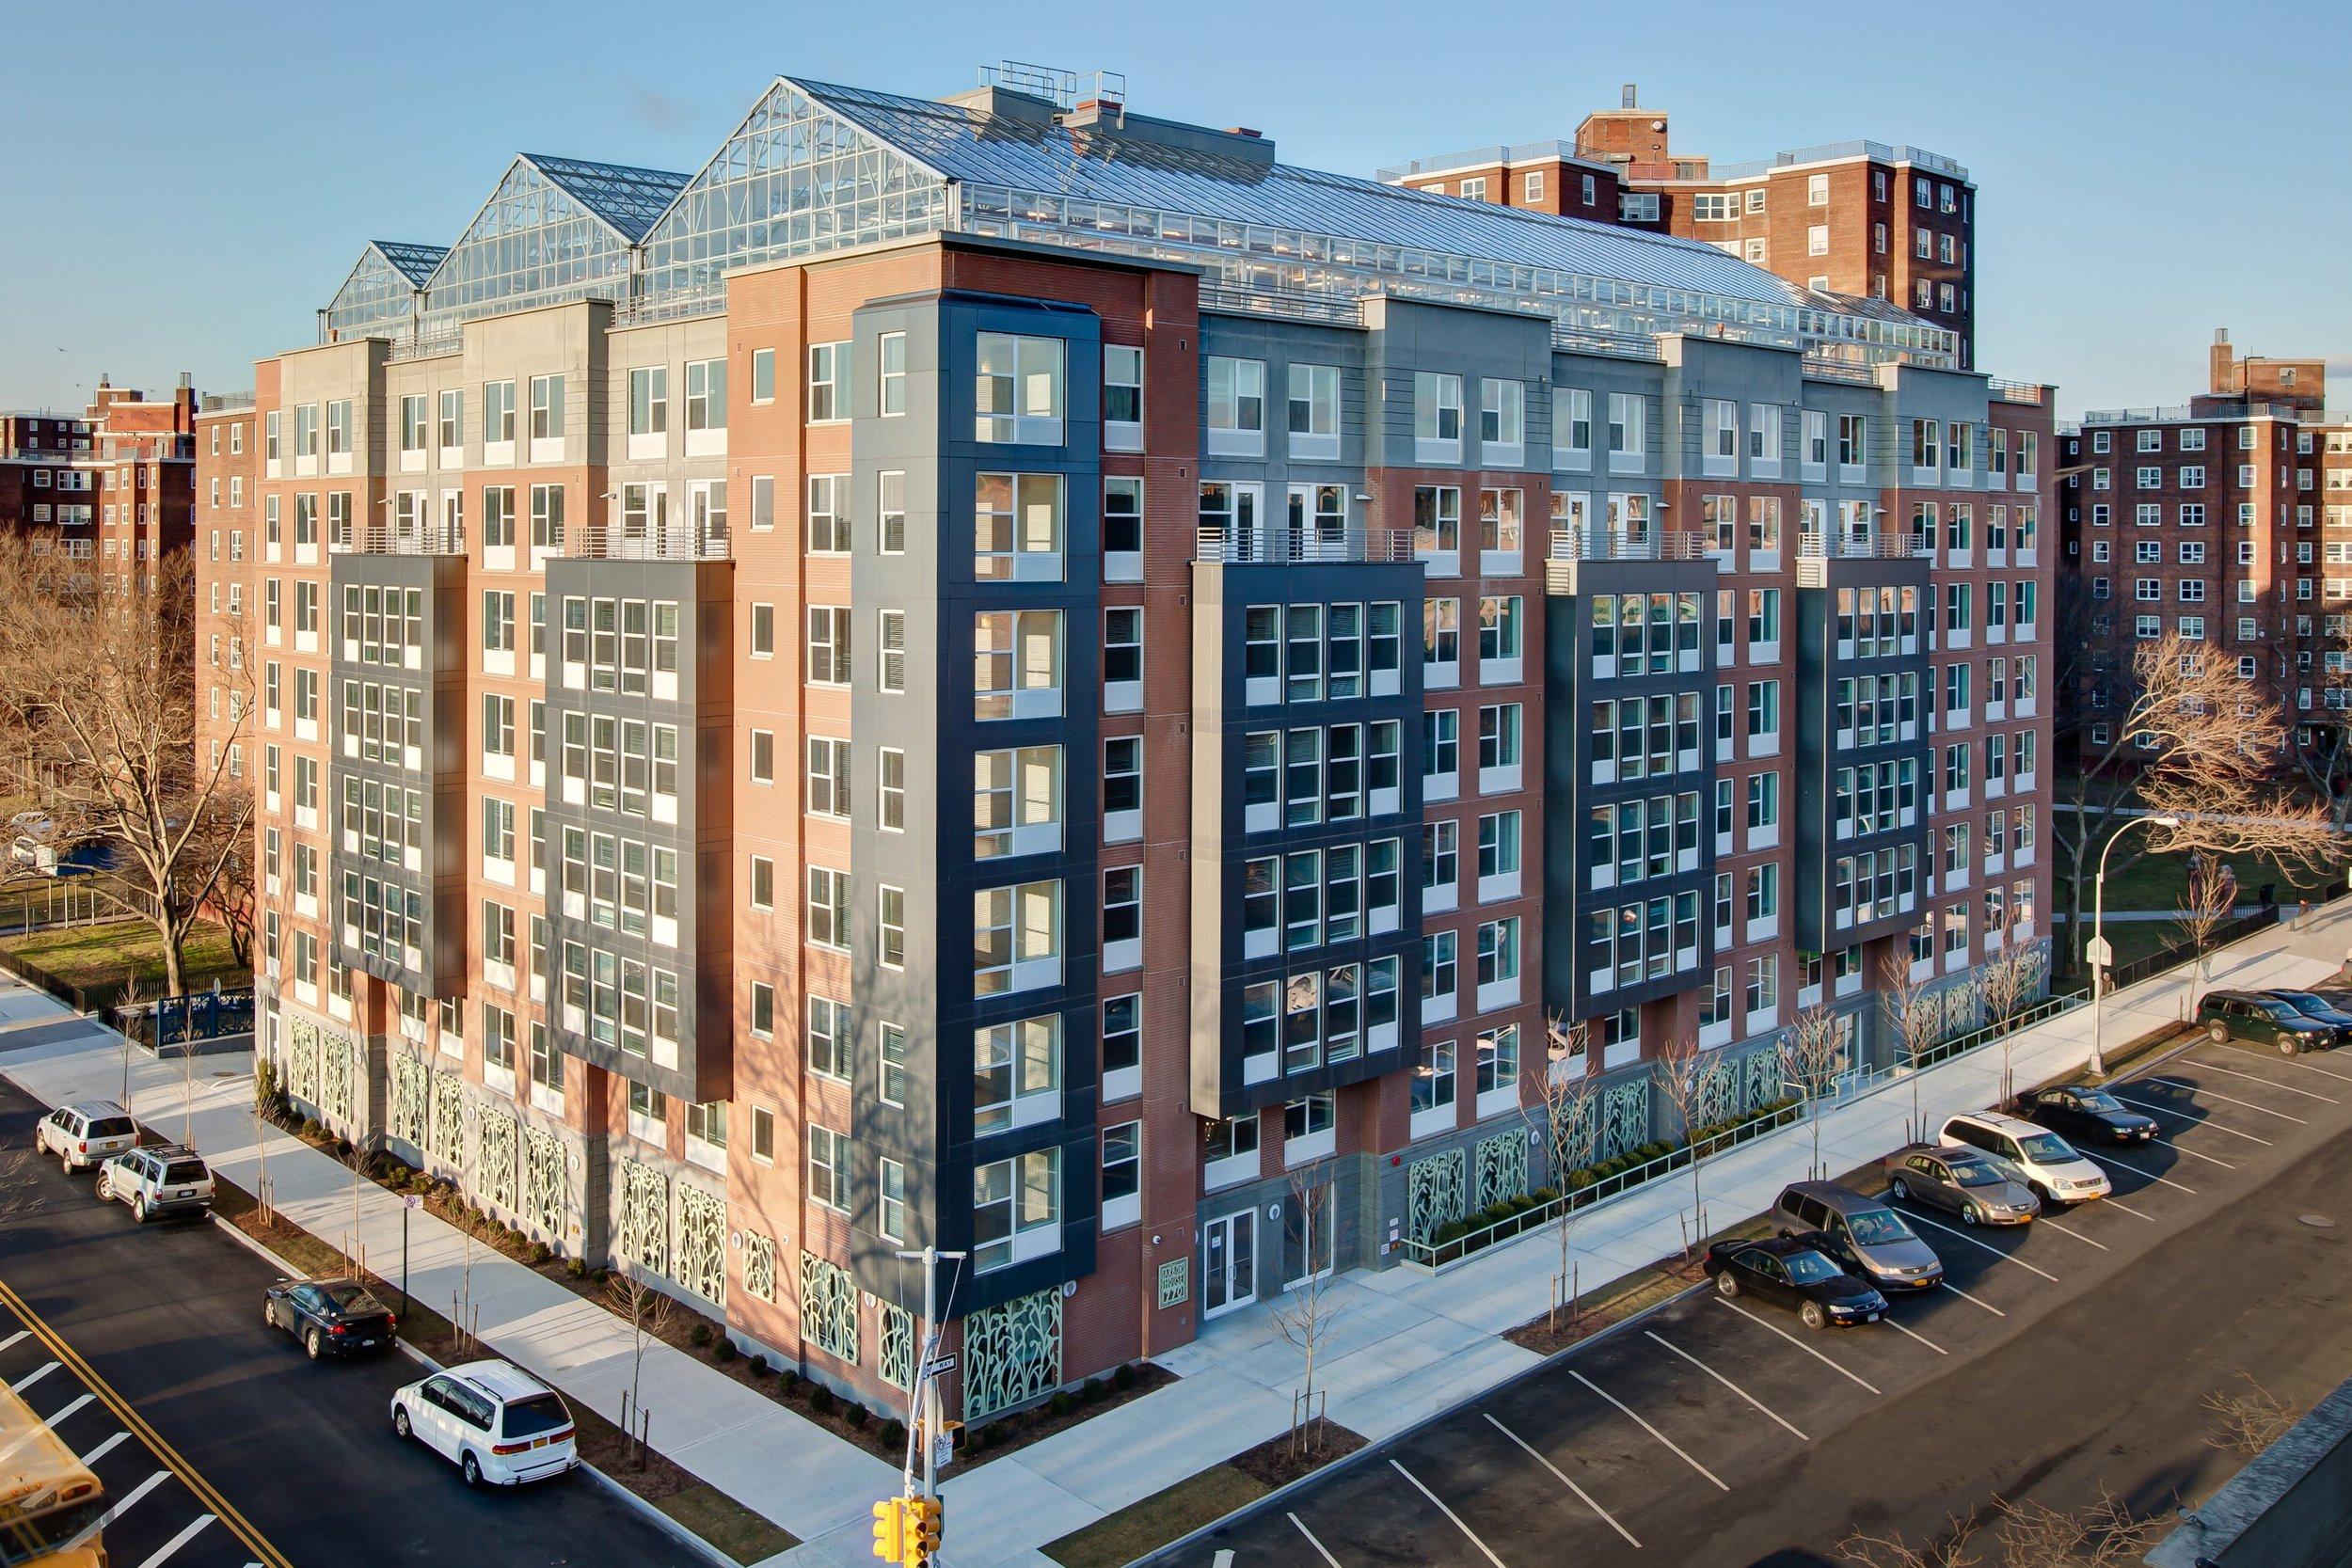 Arbor House, 770 East 166th Street, Bronx, New York, 10456